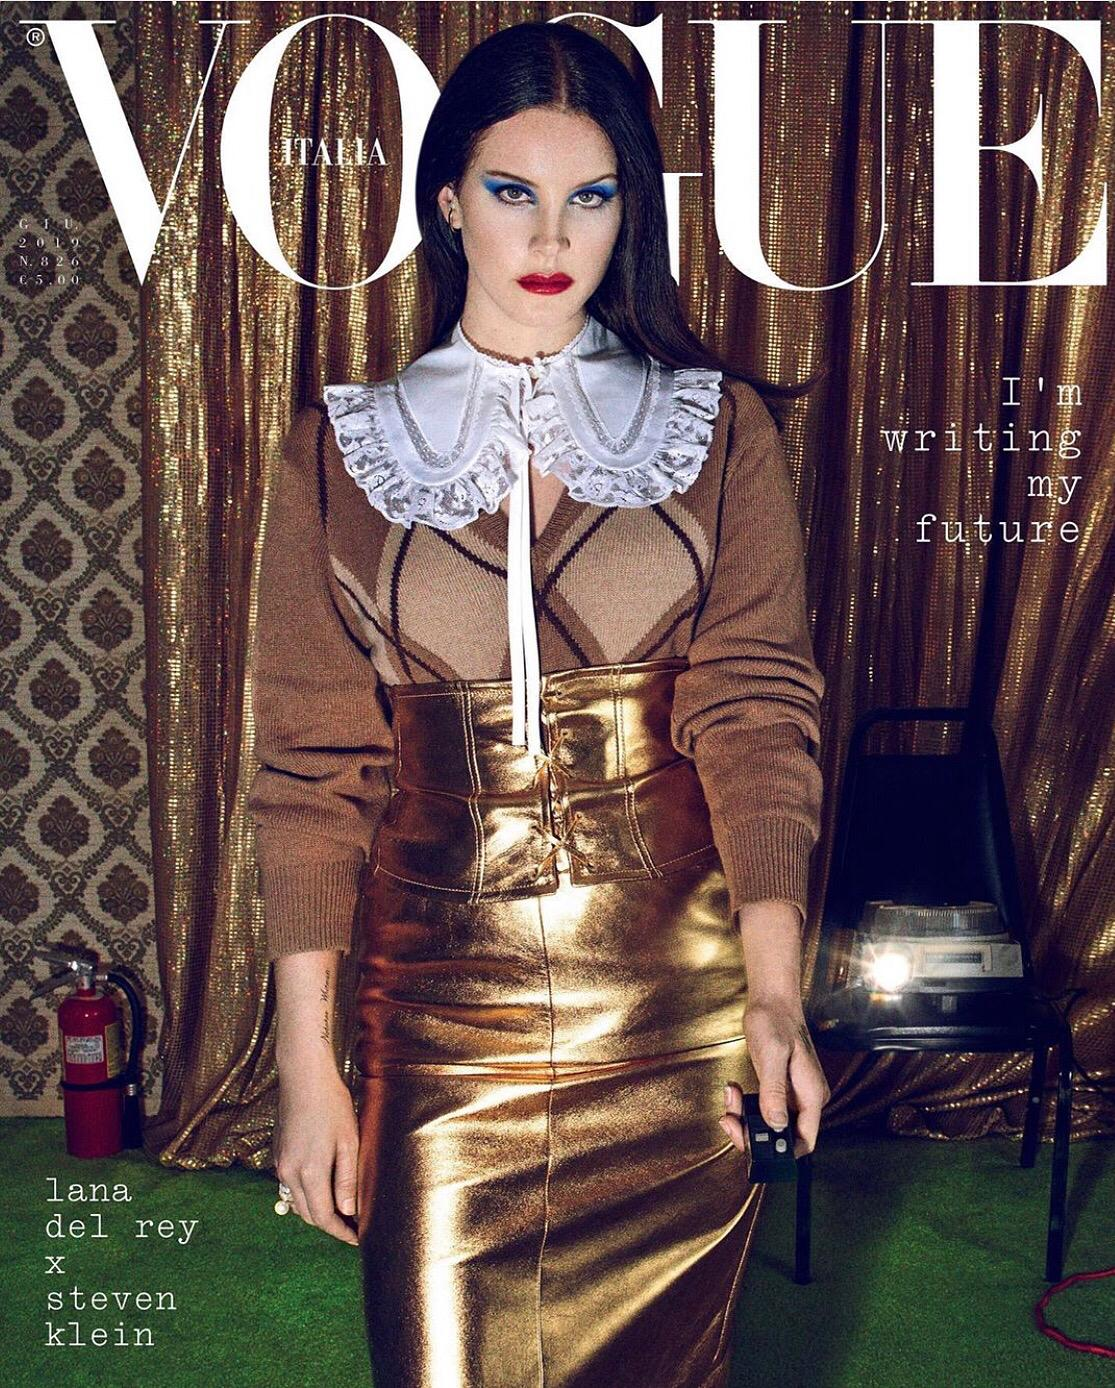 Vogue Italia June 2019 Cover Pearl Mirian Earring.jpg